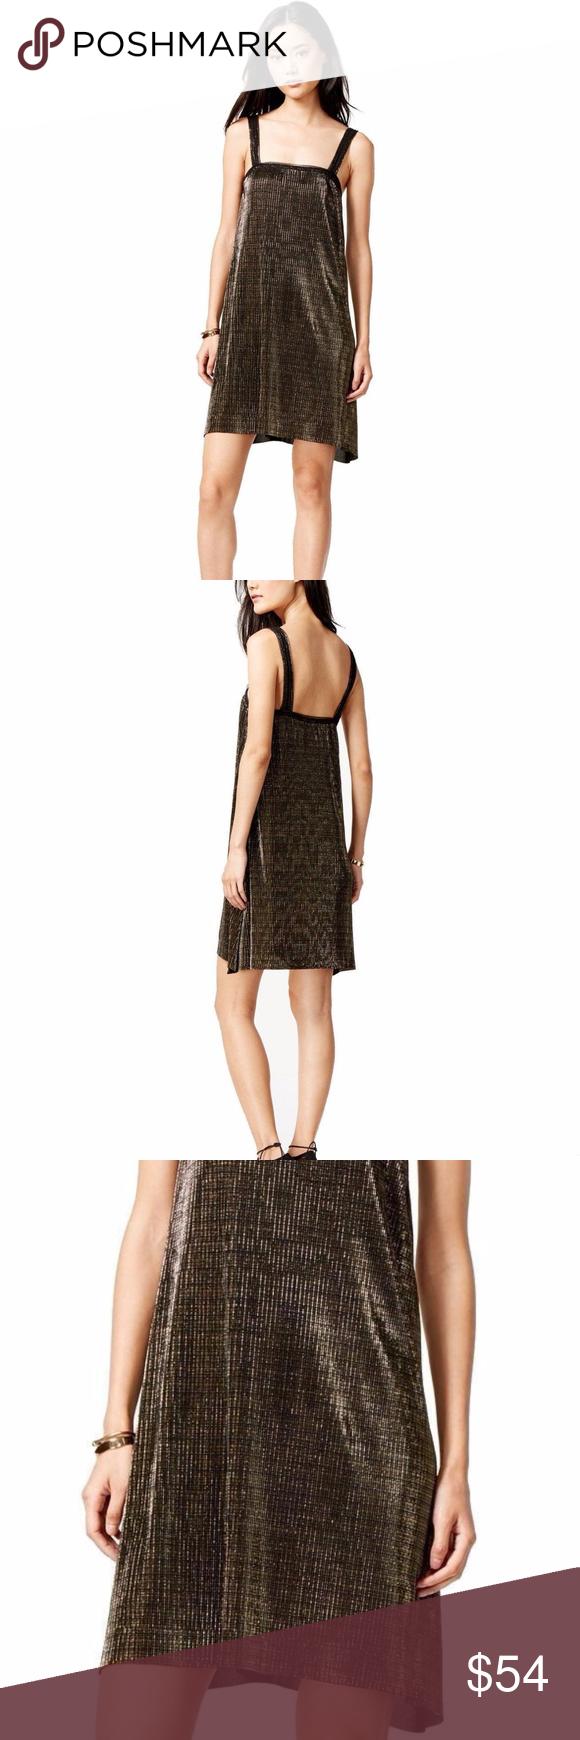 Rachel roy new metallic gold black shift dress boutique black